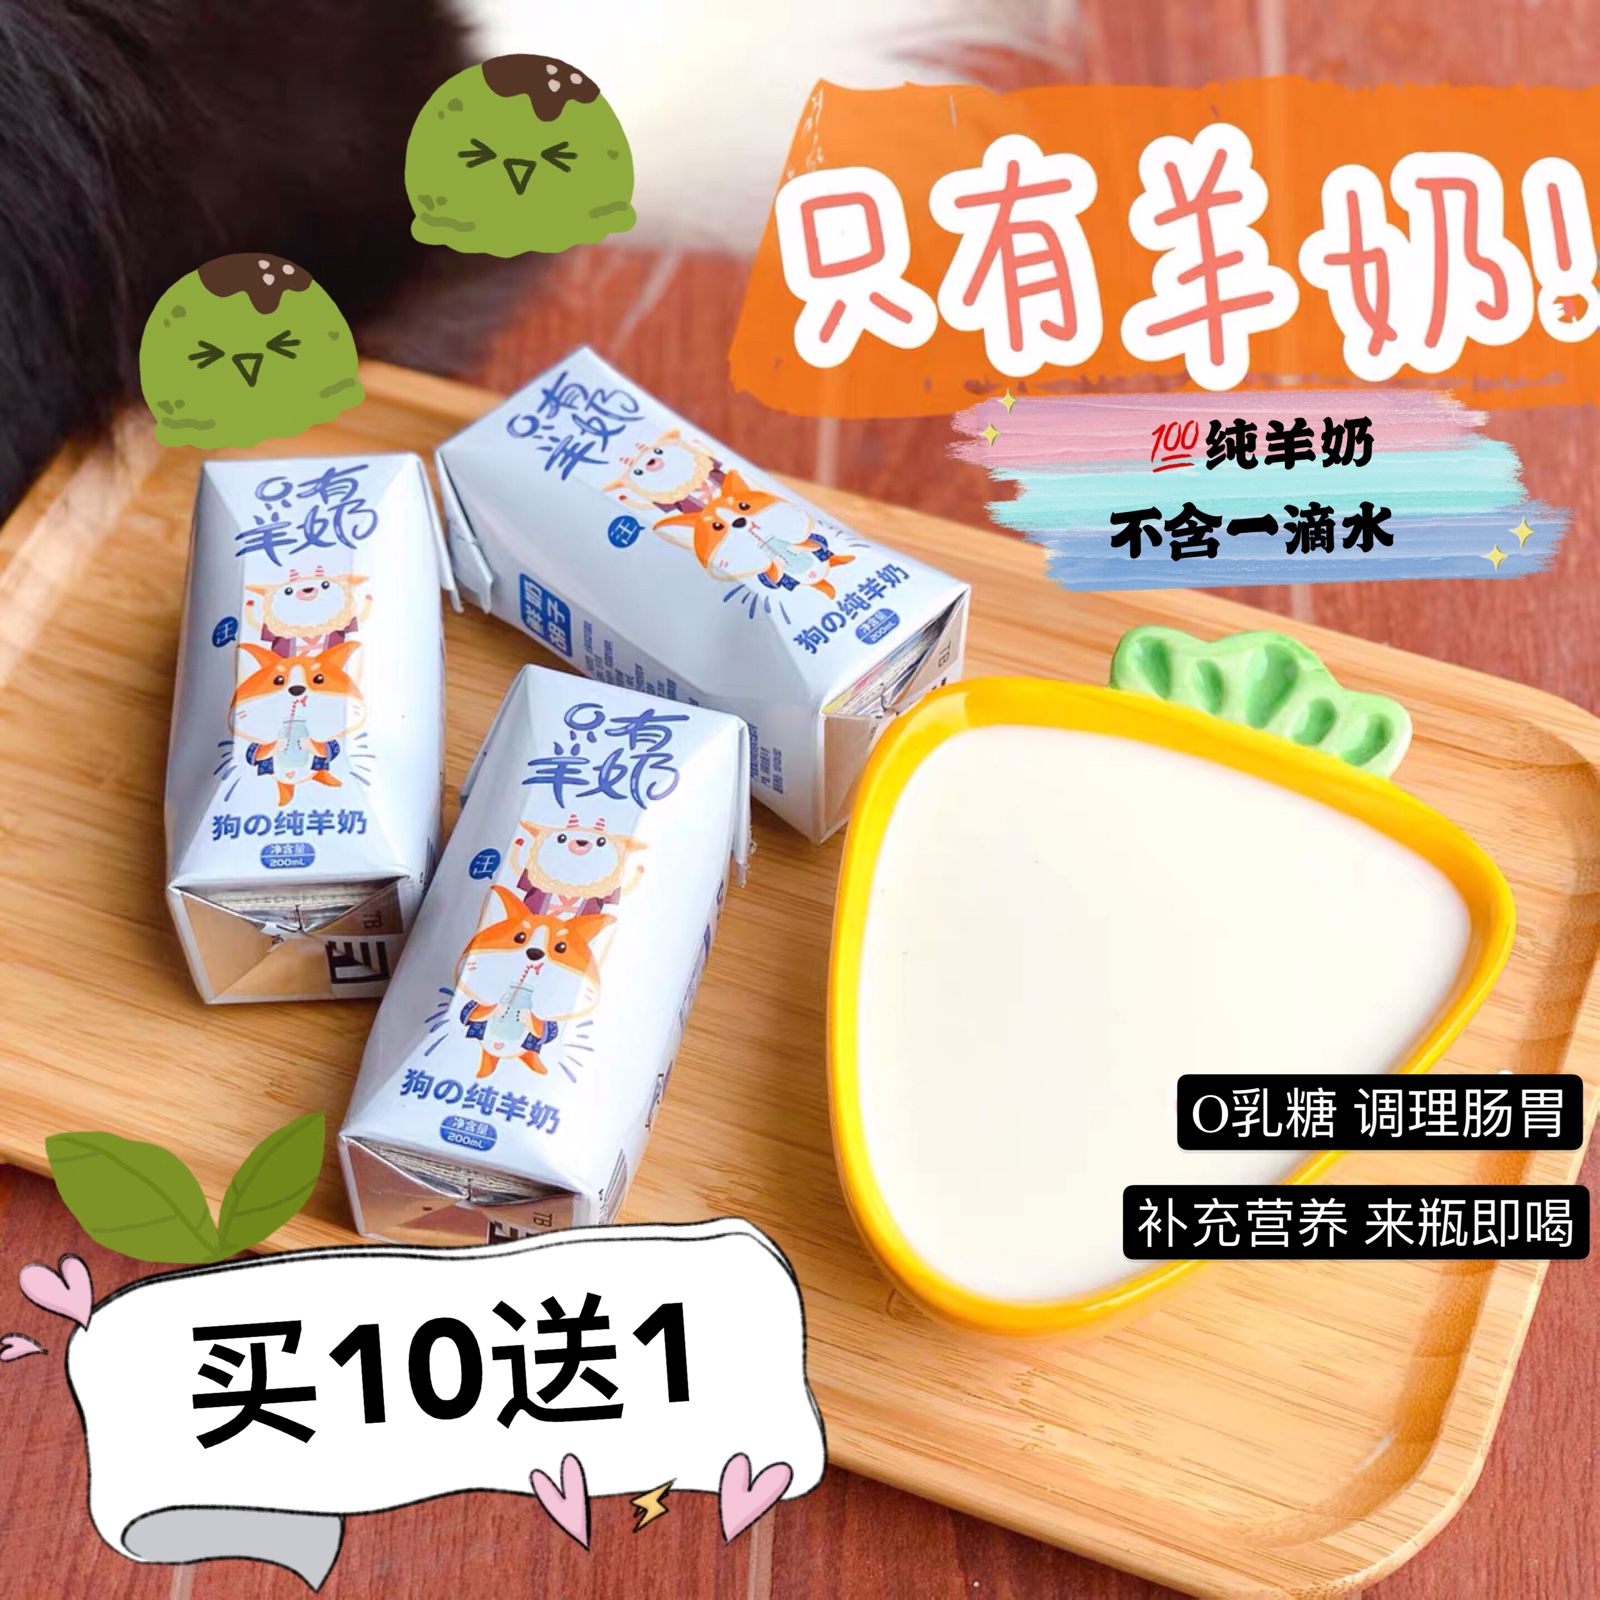 Milk, only moustache, yoghourt, pet milk, 0 lactose, dog snack, beverage, adult dog, pup, ice cream home